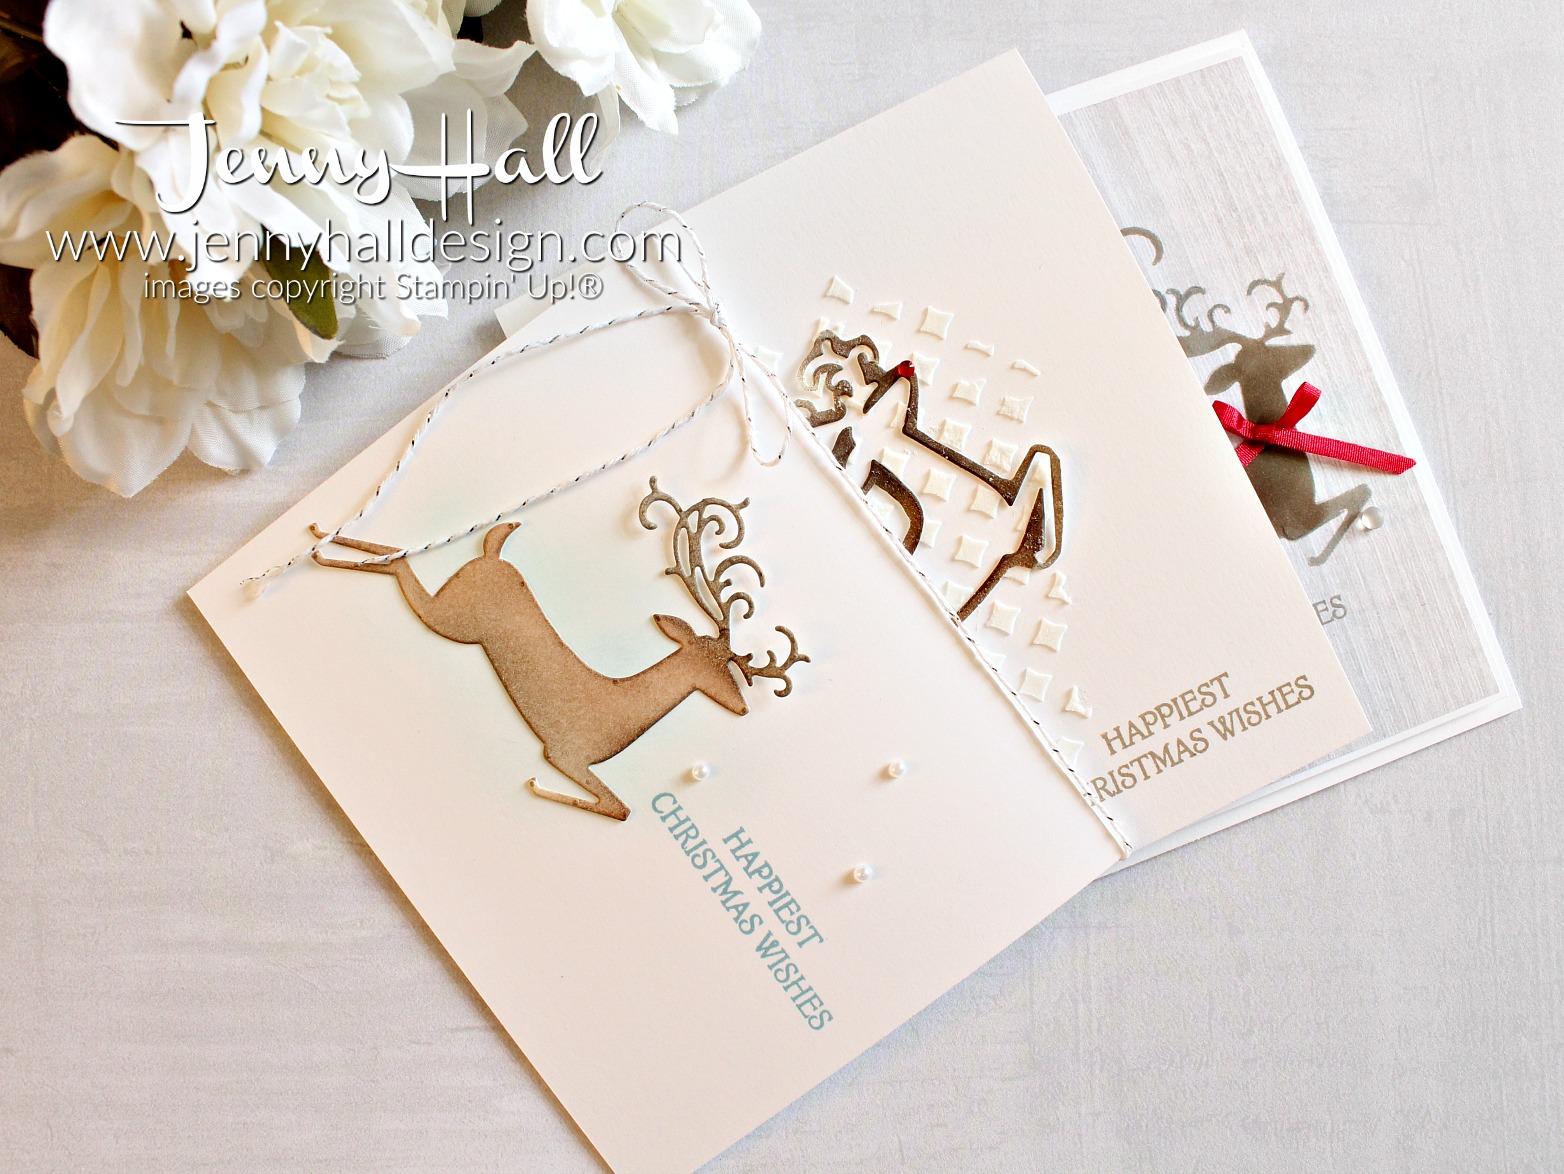 Dashing Deer die cut cards by www.jennyhalldesign.com #dashingdeer #diecutstencil #spongedauber #videotutorial #youtuber #crafty #artsandcrafts #stampinup #jennyhall #jennyhalldesign #jennystampsup #papercraft #ckdt #creatingkindnessdesignteam #cascards #cleanandsimple #countrychic #masculinecard #cardmakingdesign #diychristmascard #doityourself #cardmaking #handmadecard